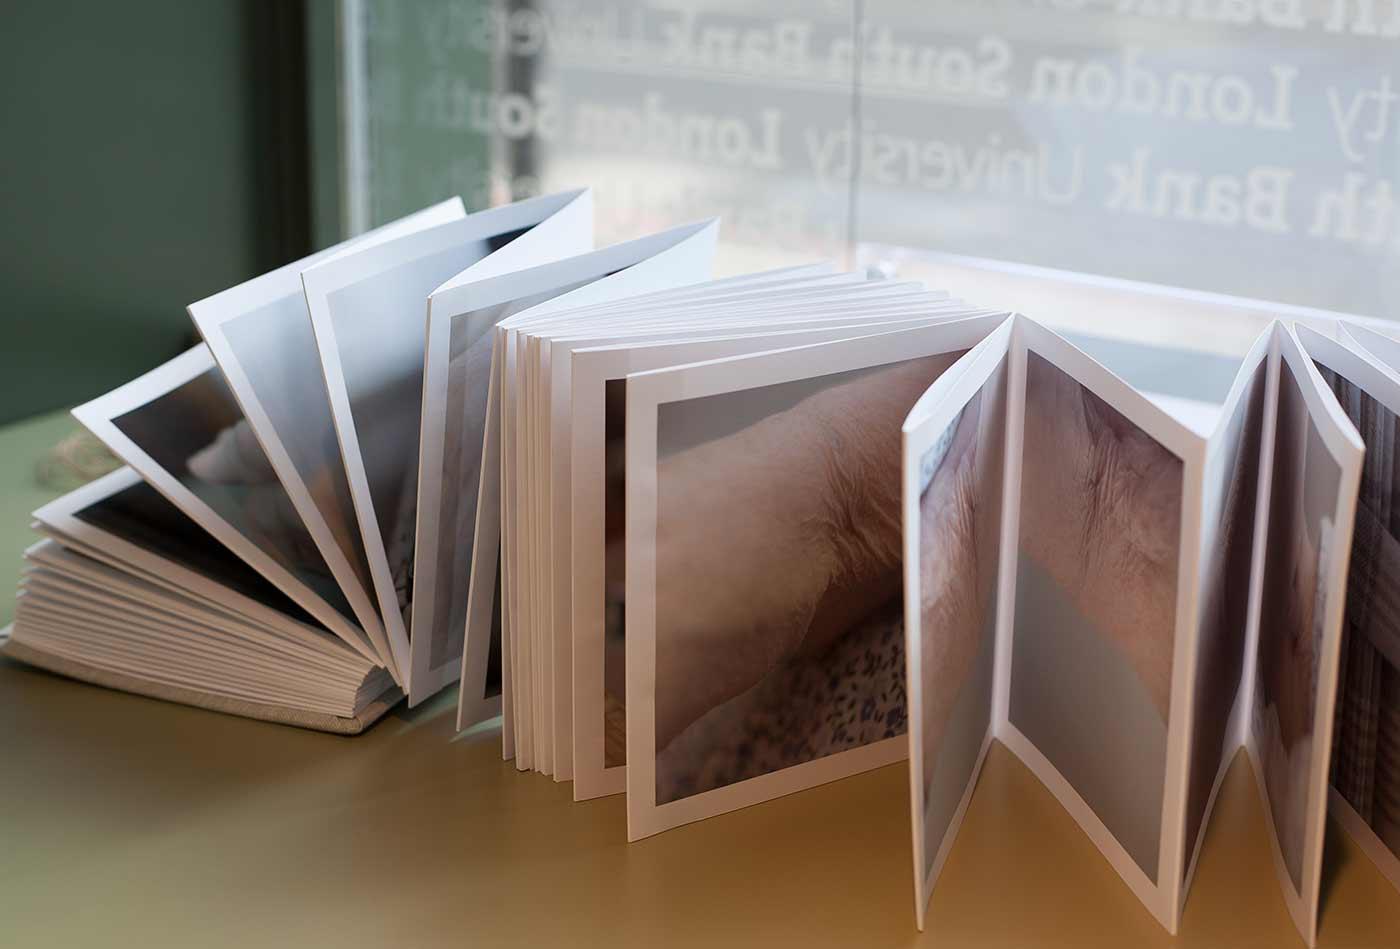 photobook-pop-up-1-6